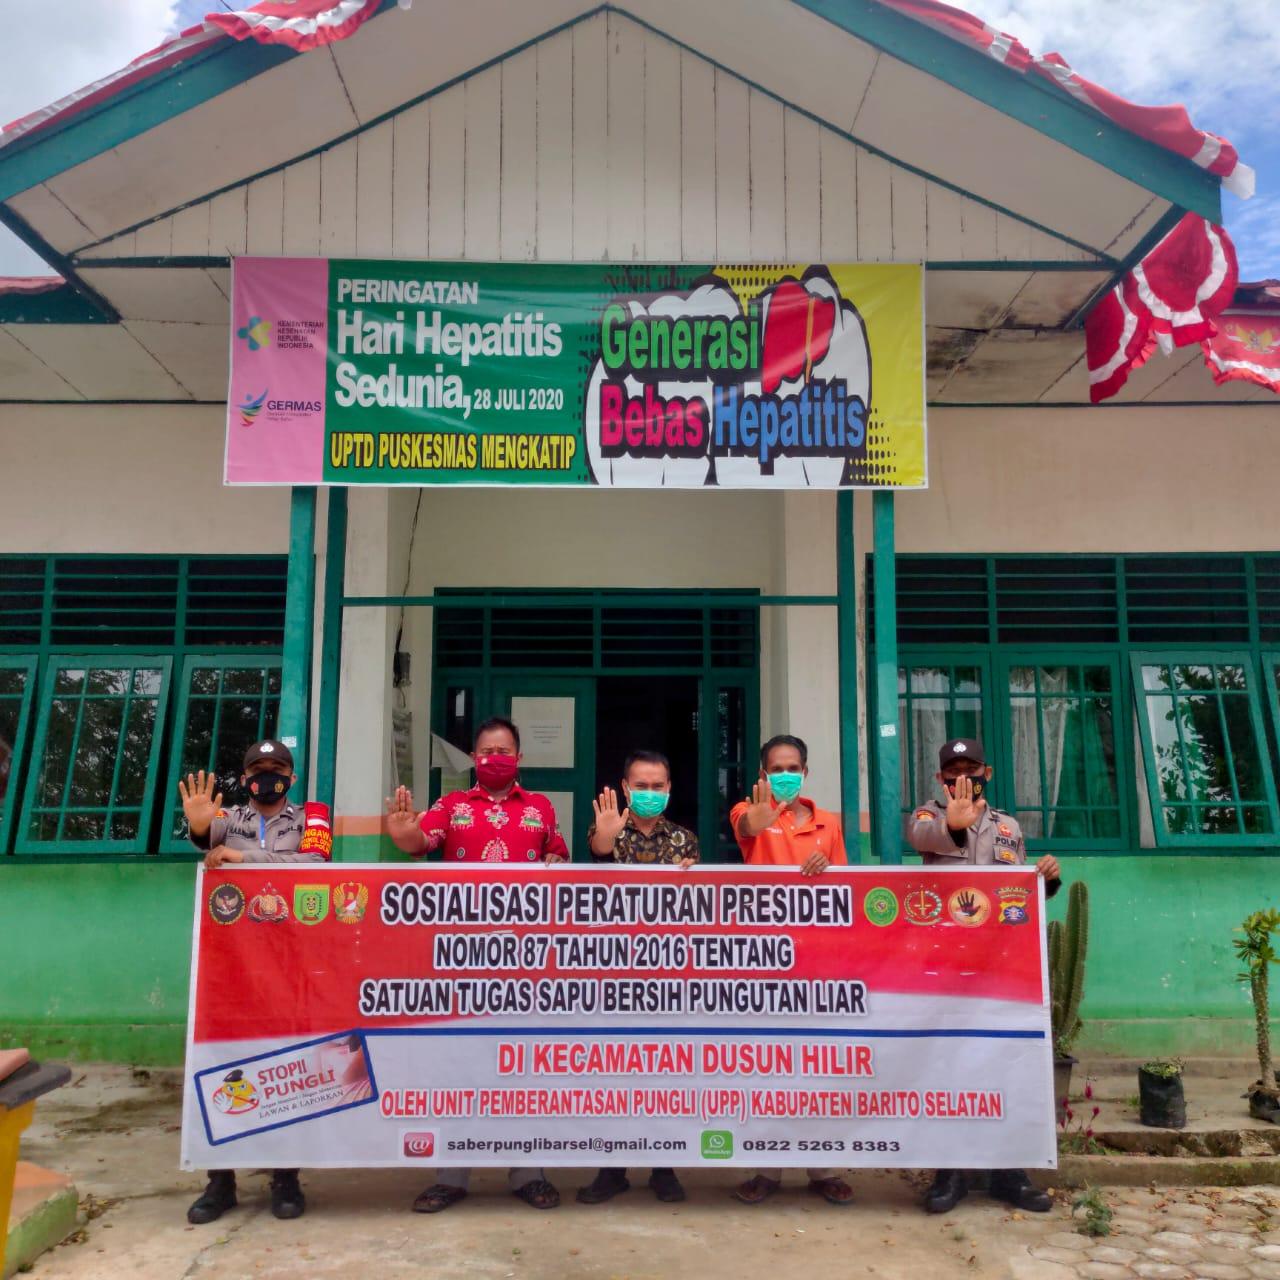 Ajak Perangi Pungli, Personel Polsek Dushil Laksanakan Sosialisasi Perpres Nomor 87 Tahun 2016